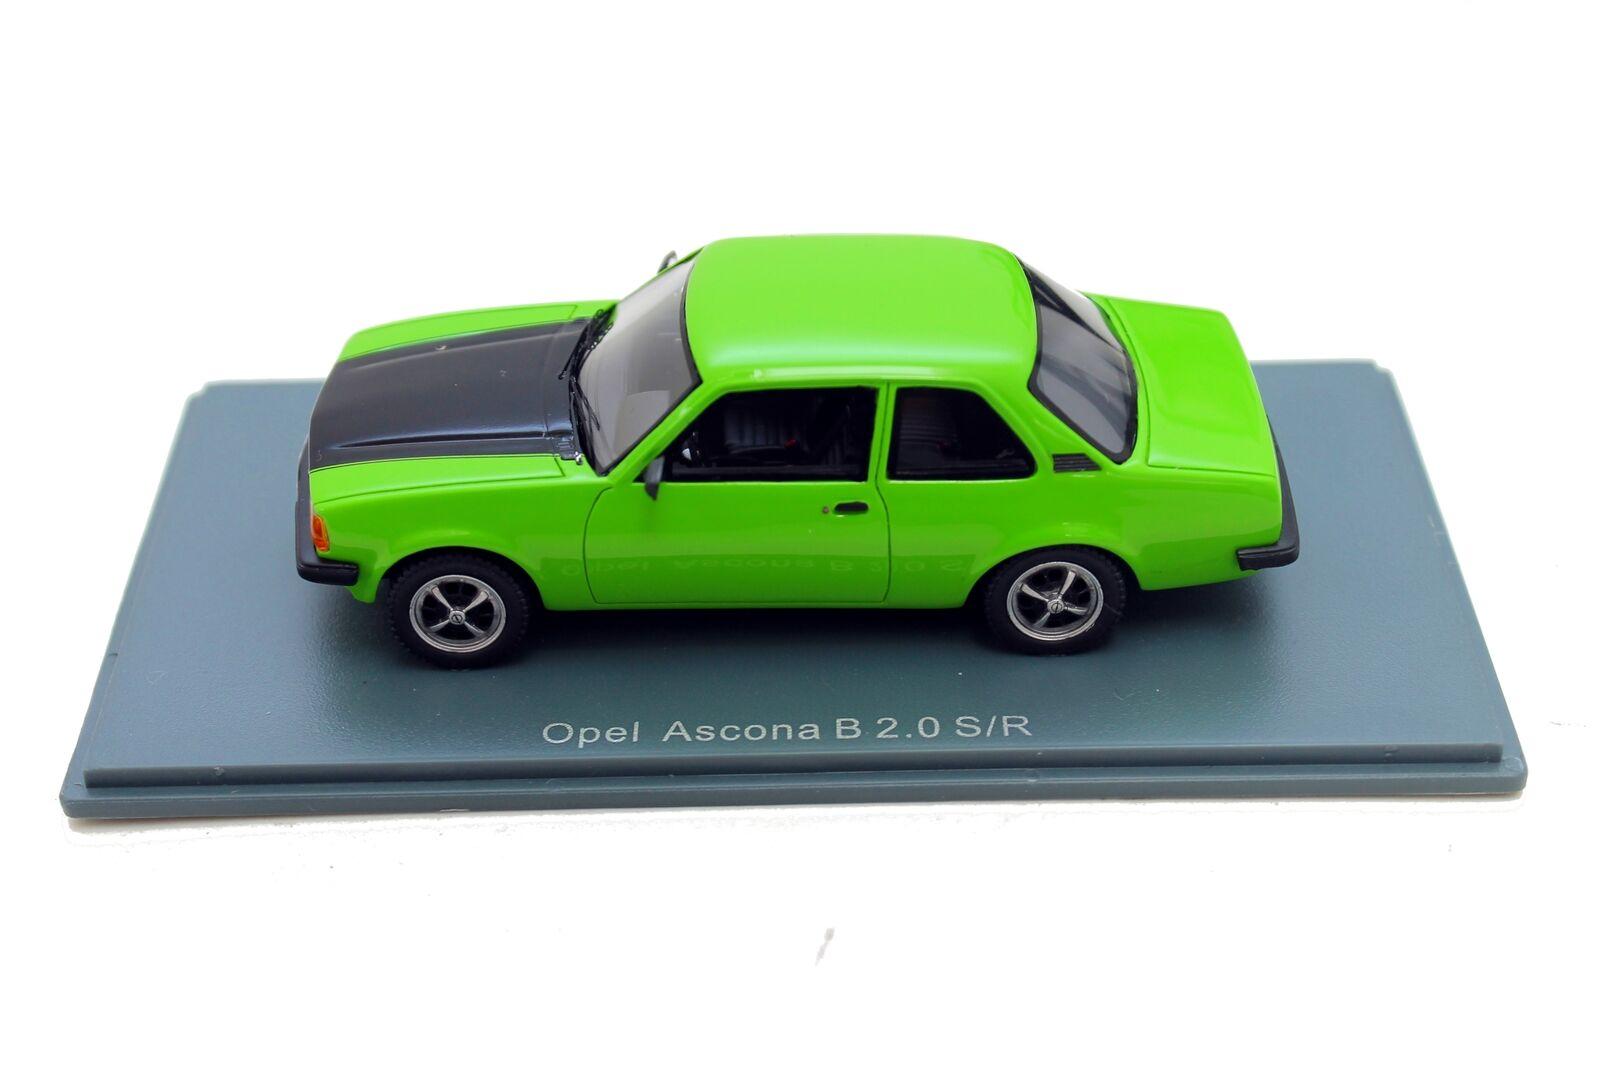 Opel Ascona B 2.0 S R 1 43 maqueta de coche modelo de coleccionista oc11156